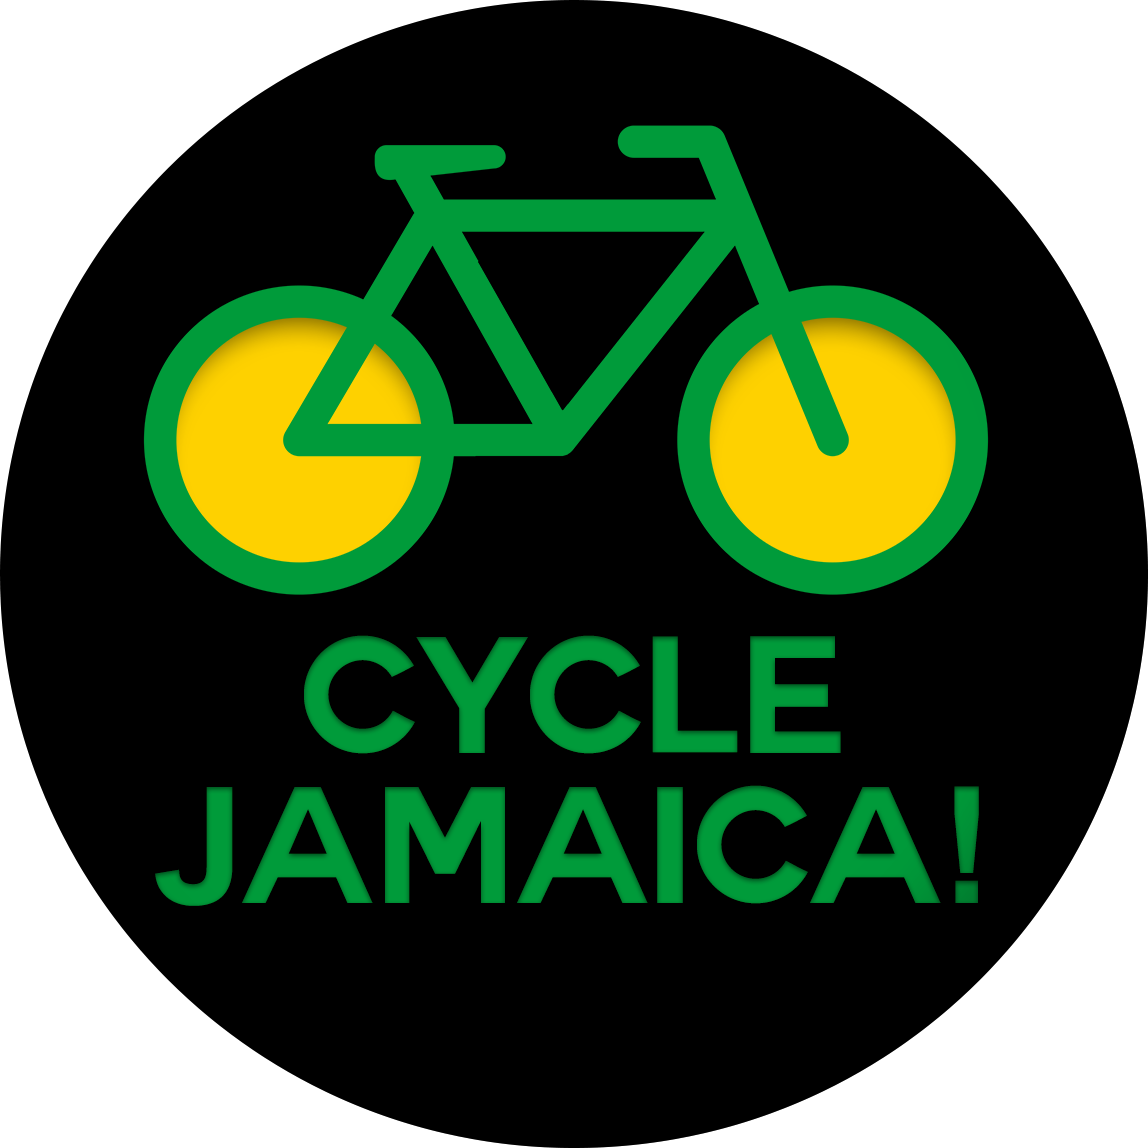 Cycle Jamaica